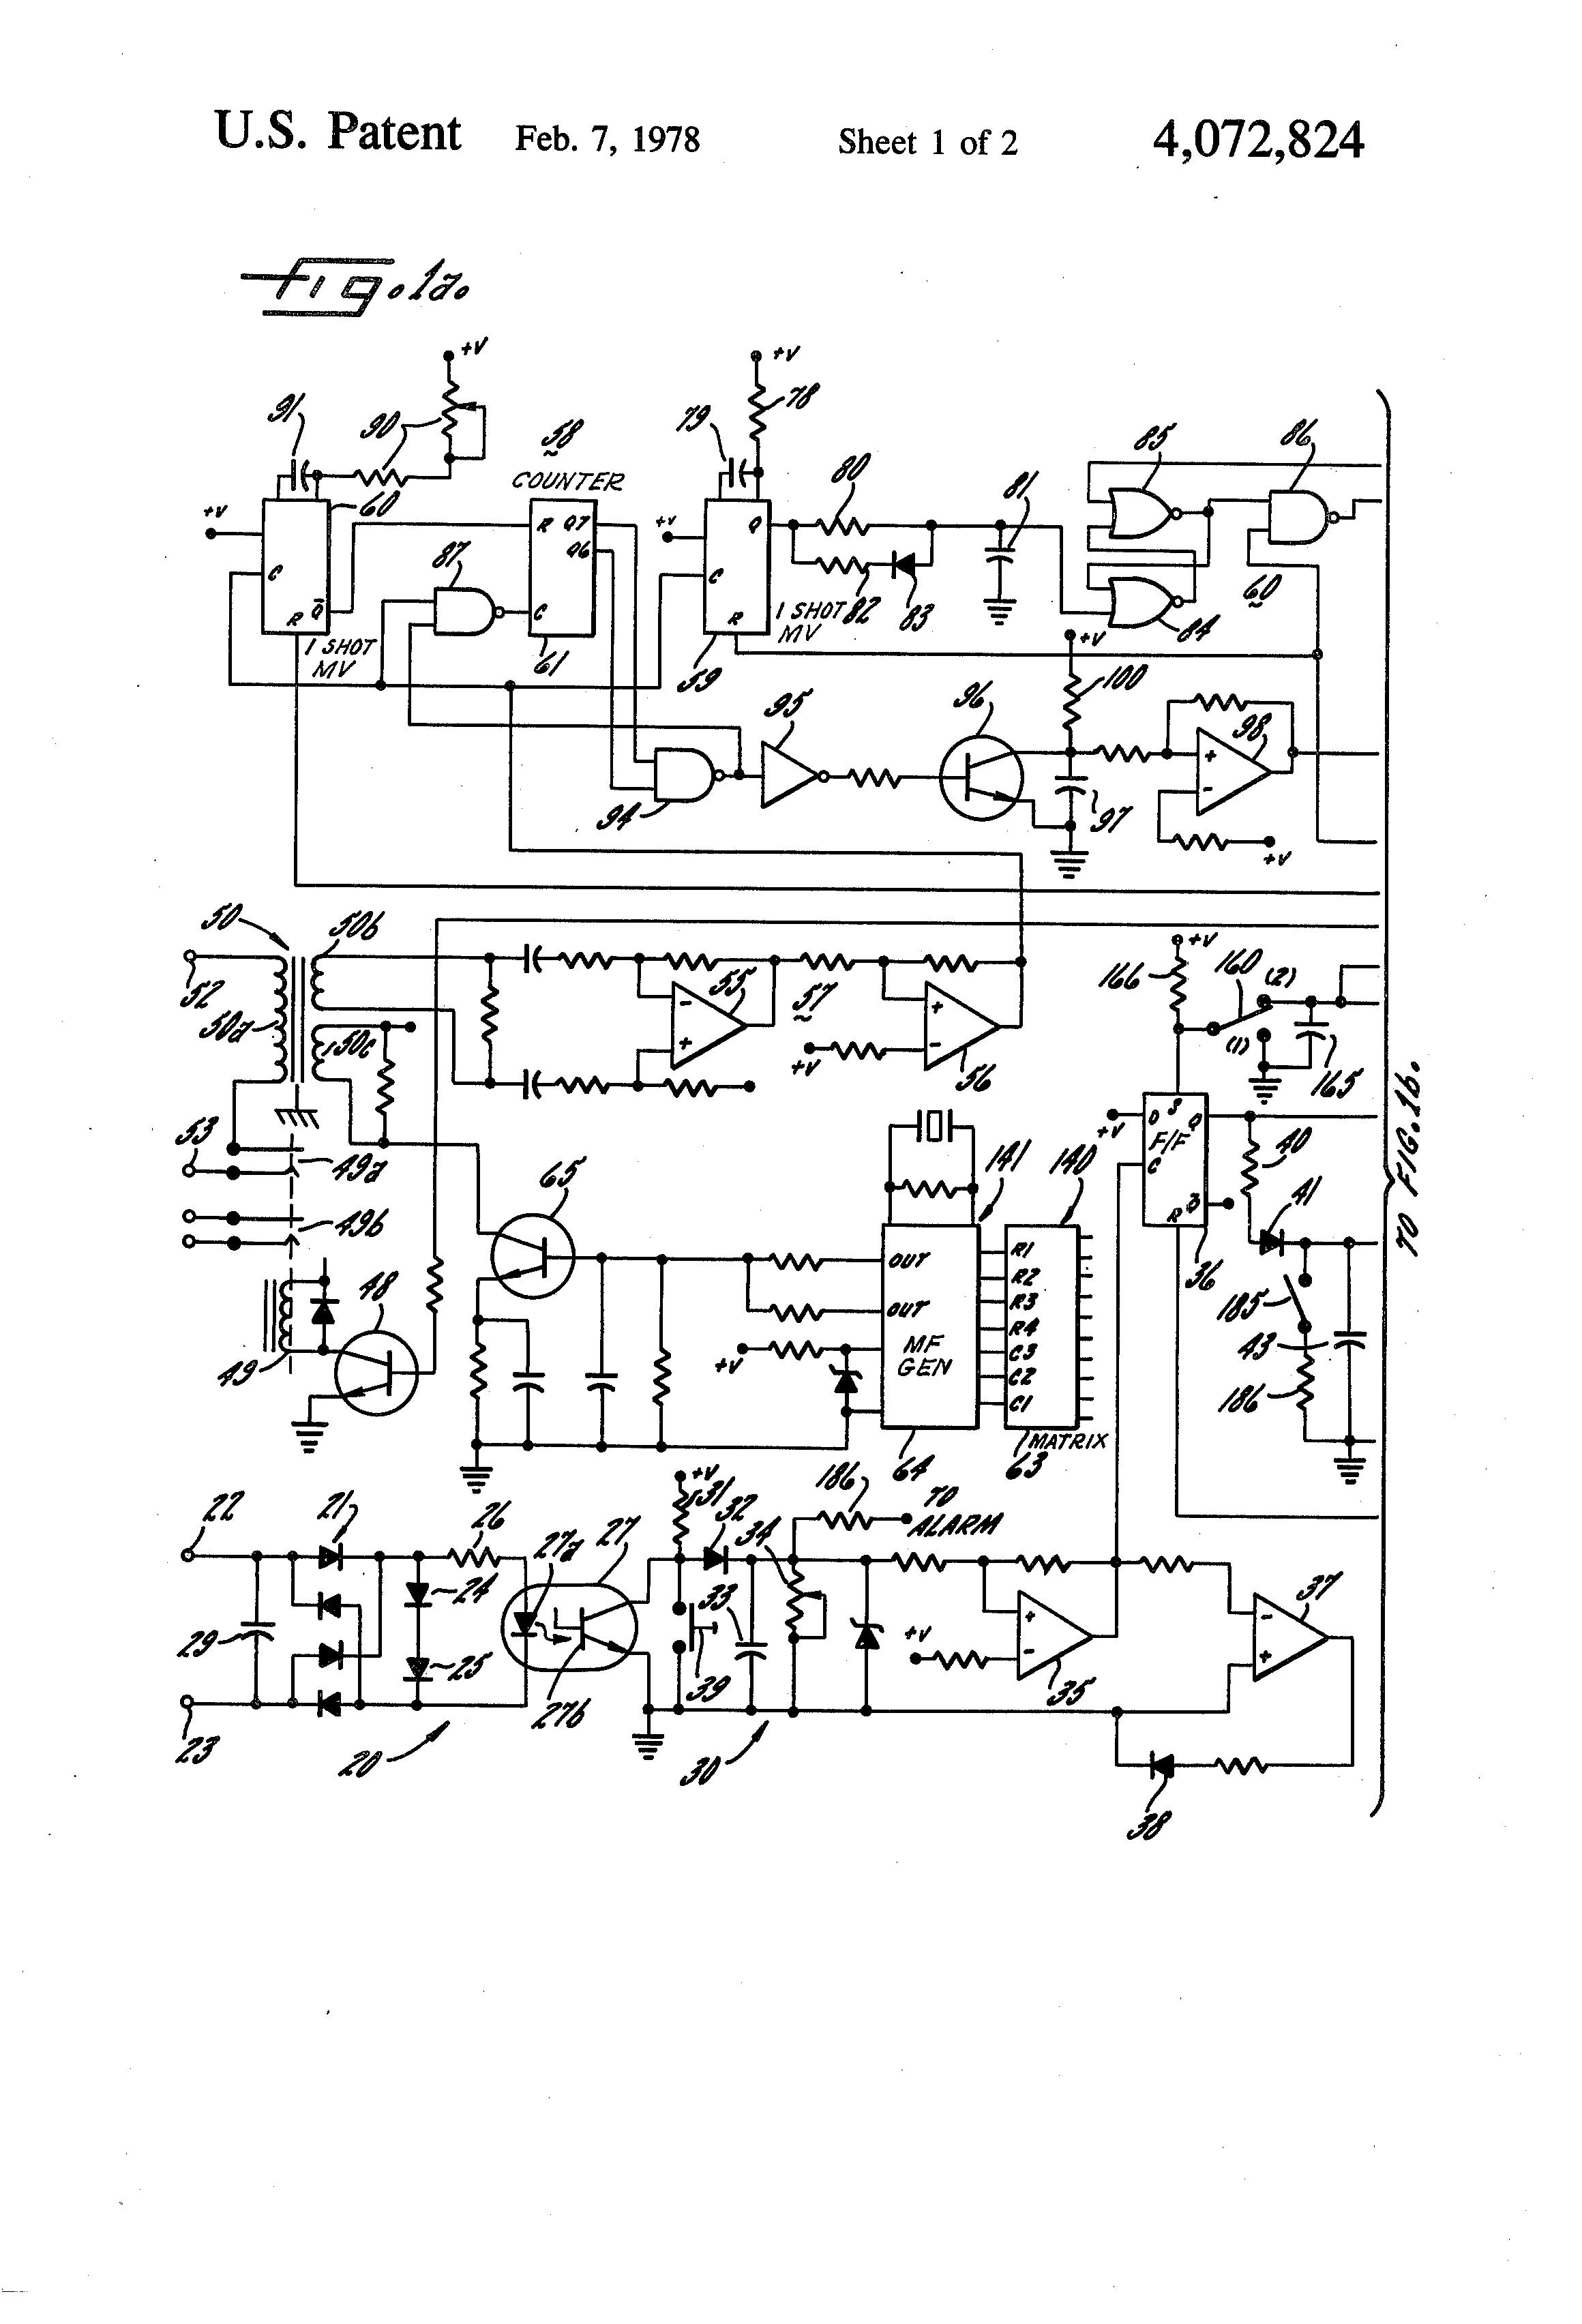 automatic dialer machine